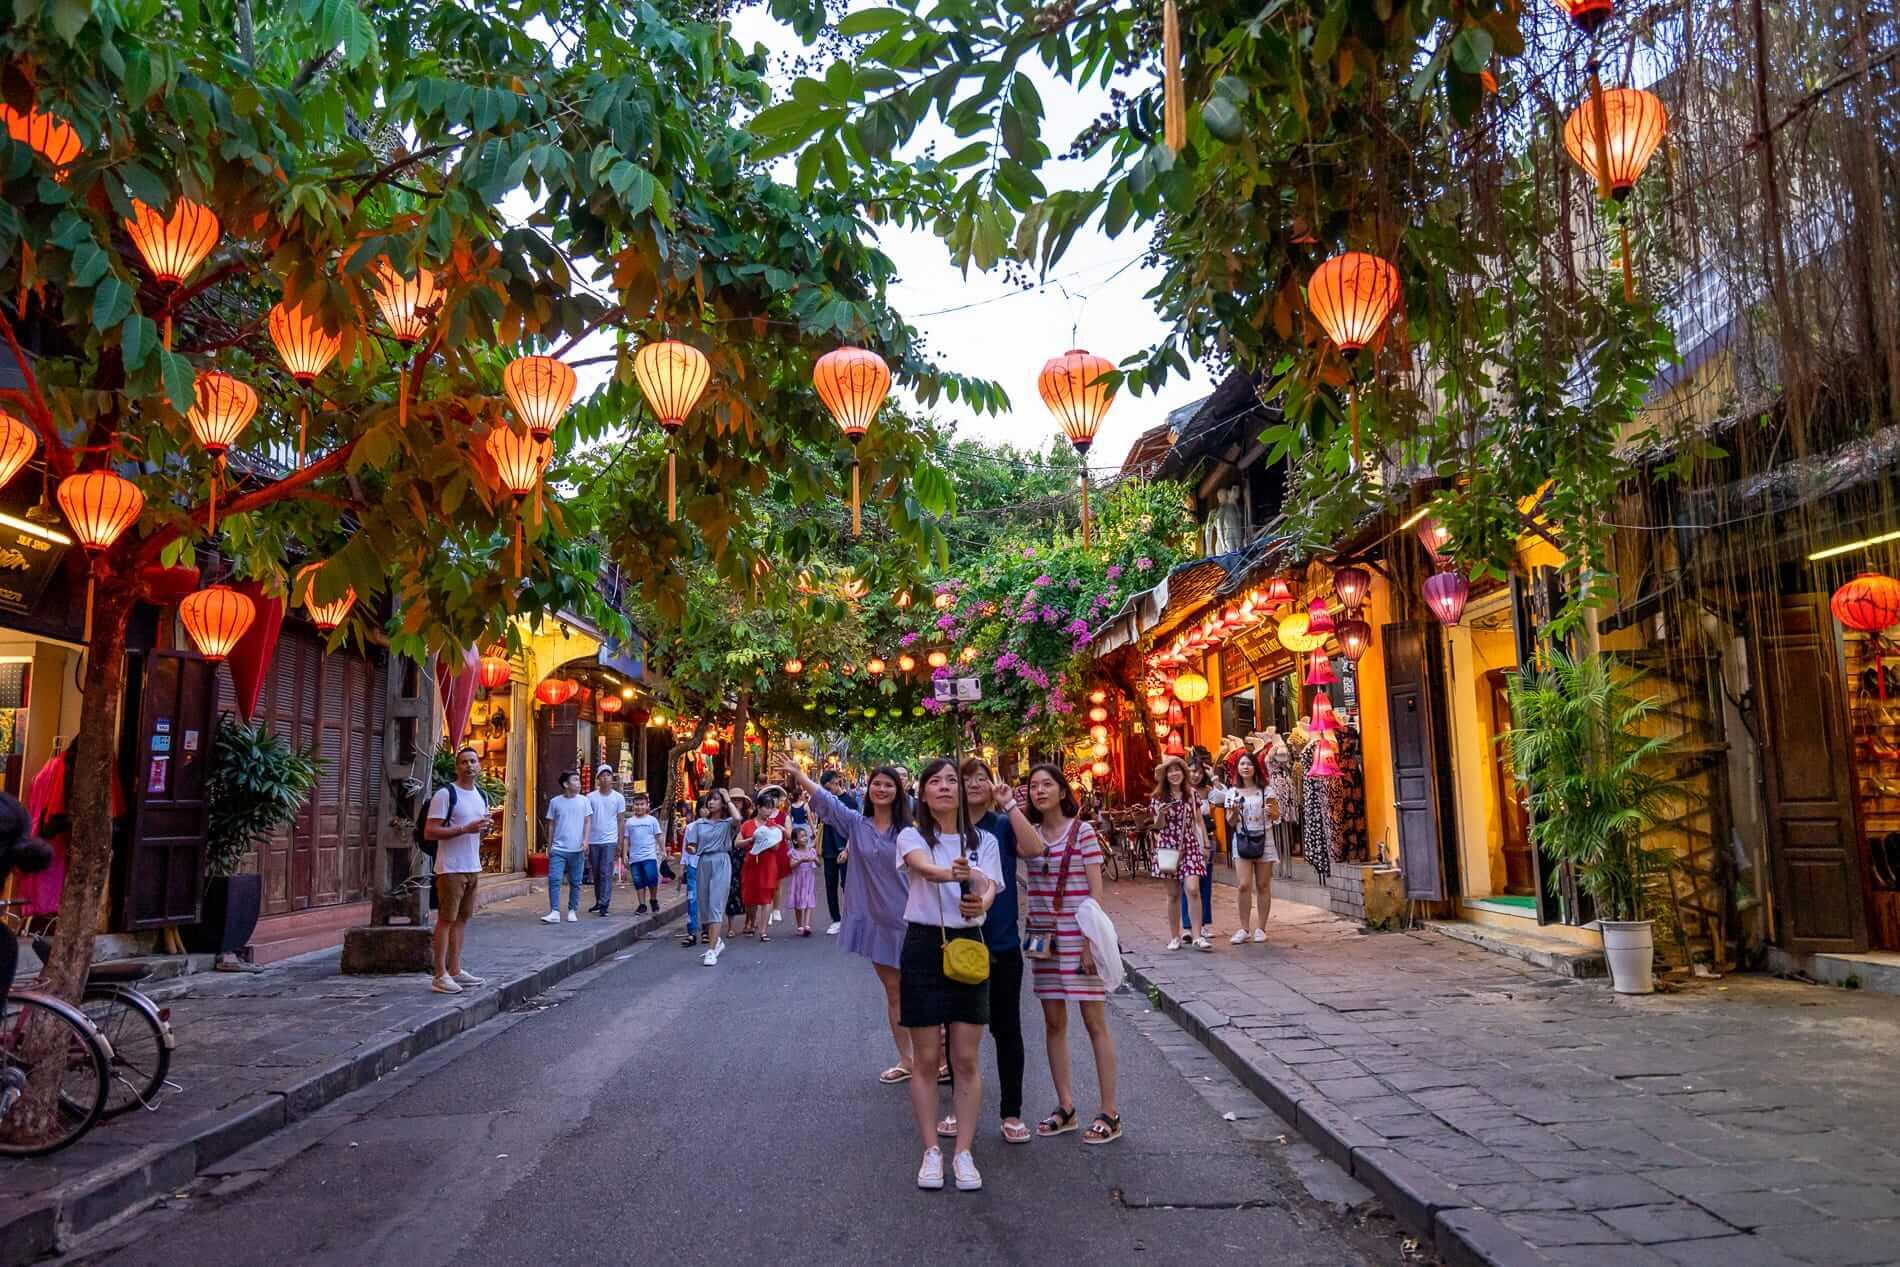 Lantern lined streets